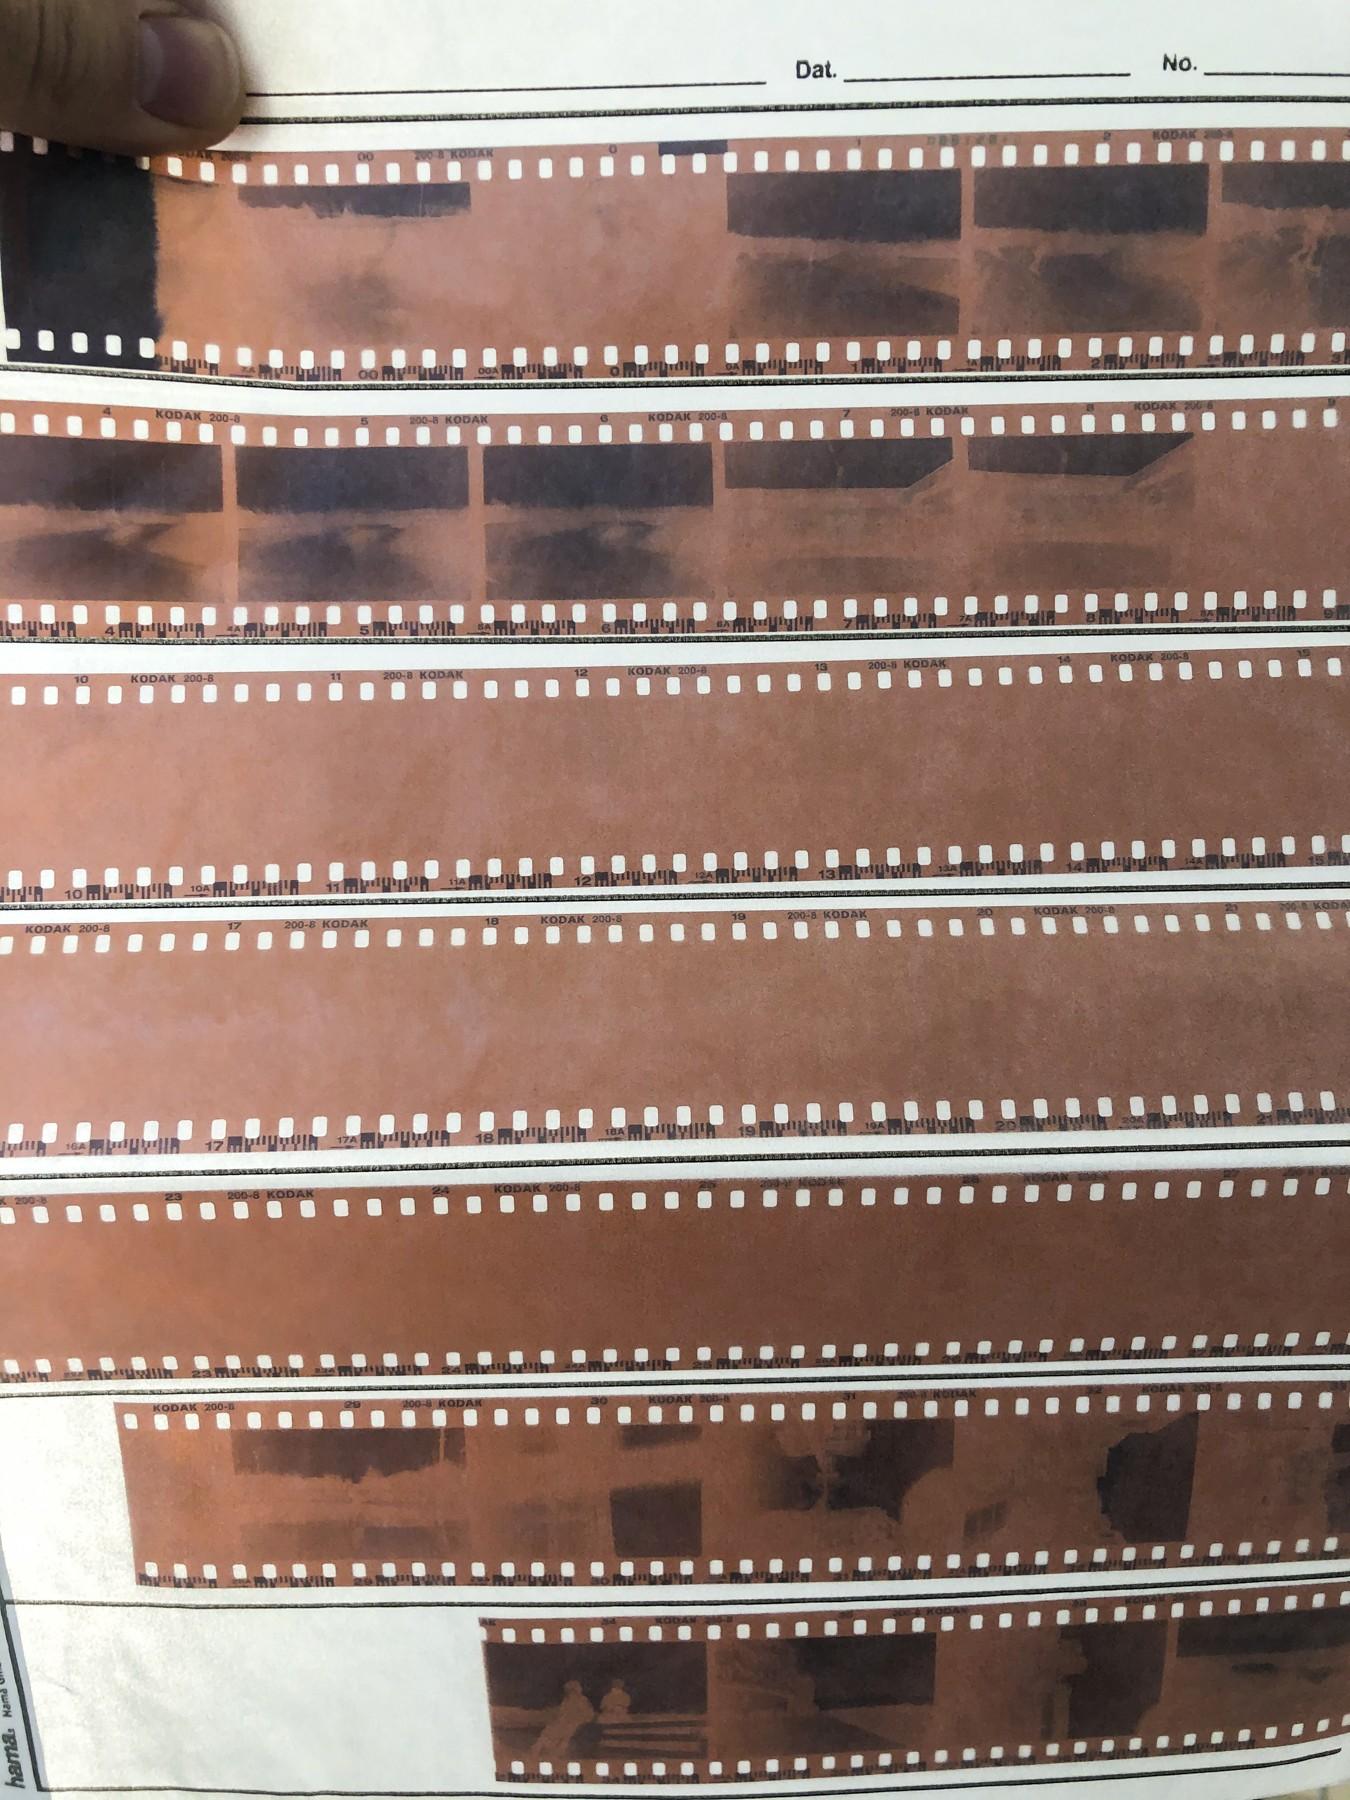 Fejleksponering - Agfa Reusable 35mm Camera